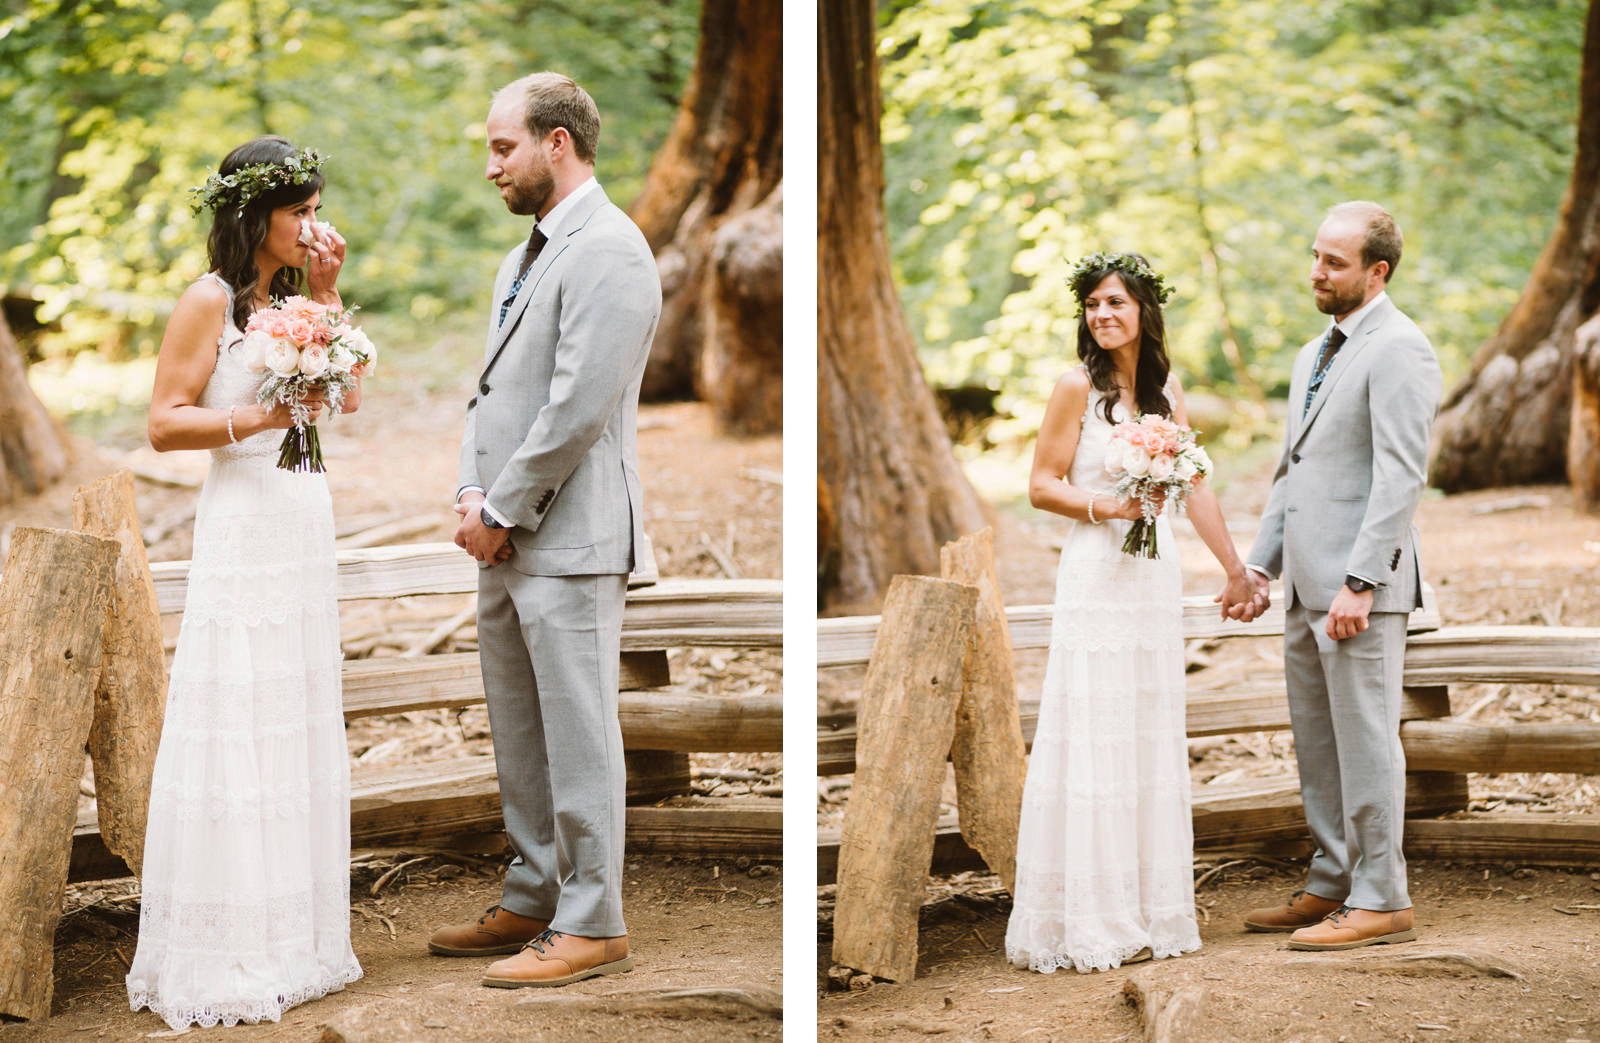 yosemite-intimate-wedding-045 YOSEMITE INTIMATE WEDDING